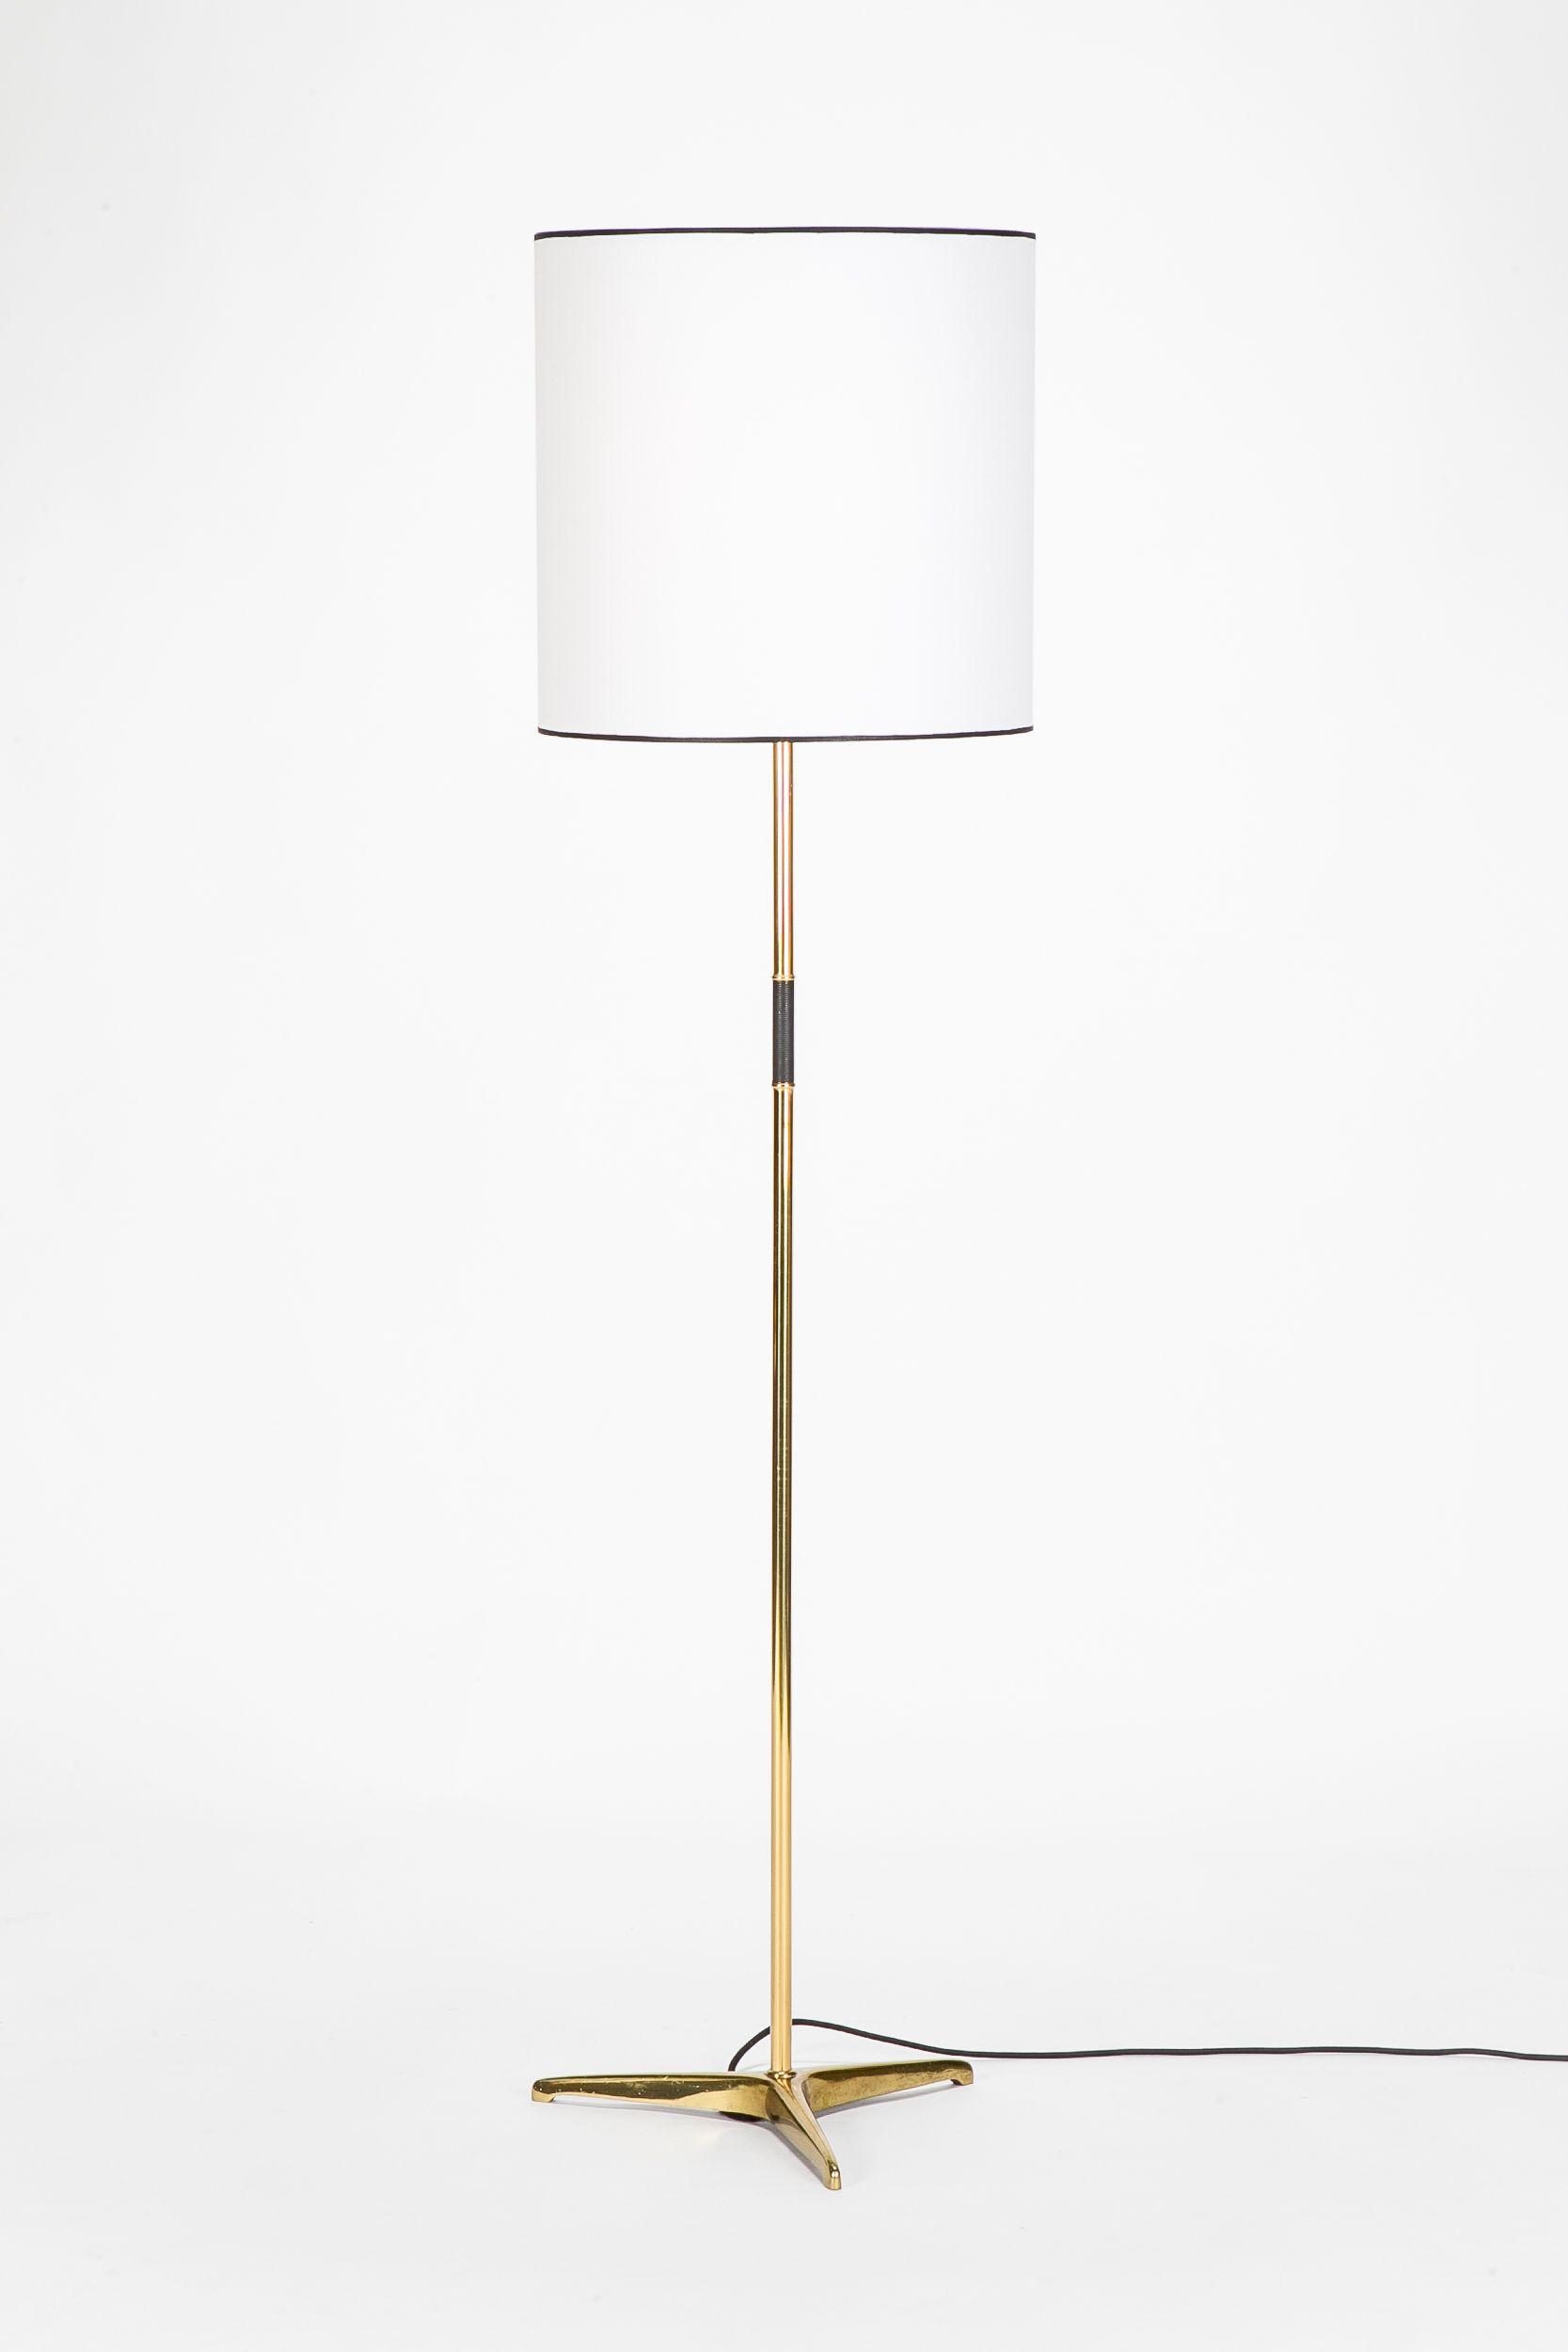 Bag Turgi Brass Floor Lamp 50 S Mit Bildern